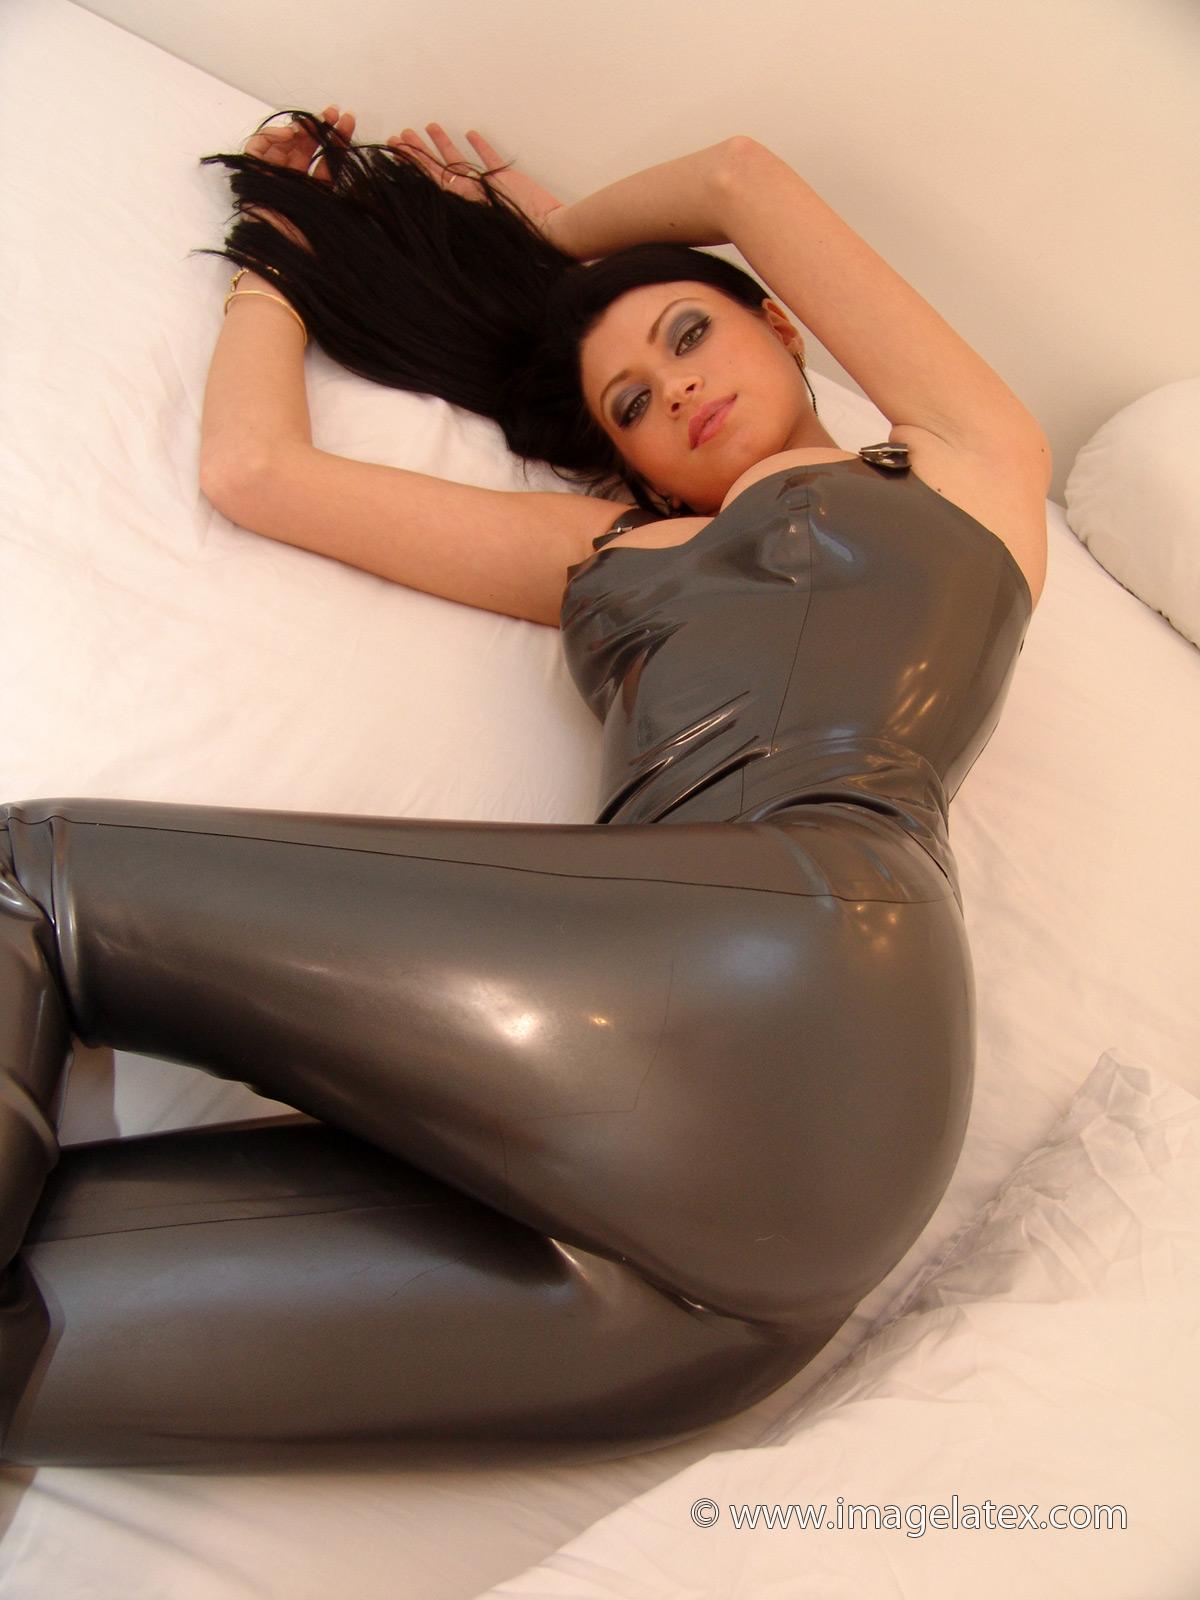 More modest leather fetish garb consider